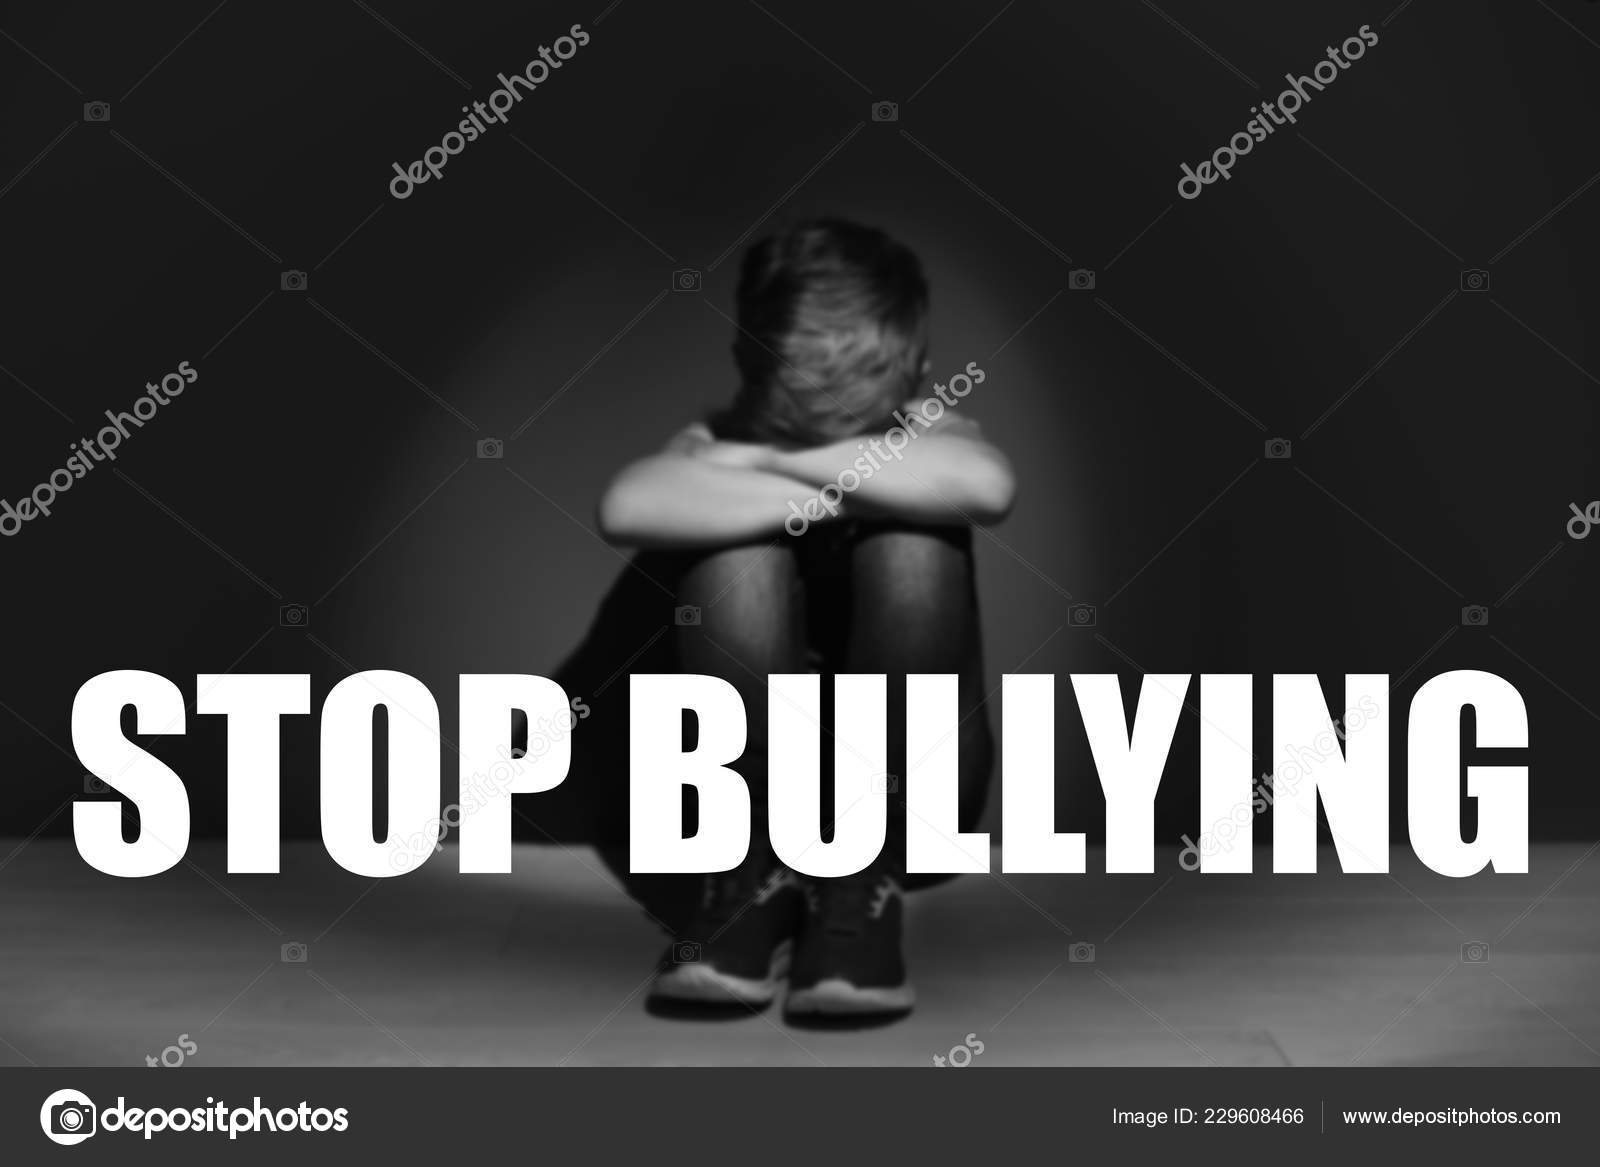 Mensajes Stop Bullying Triste Niño Sentado Piso Junto Oscura